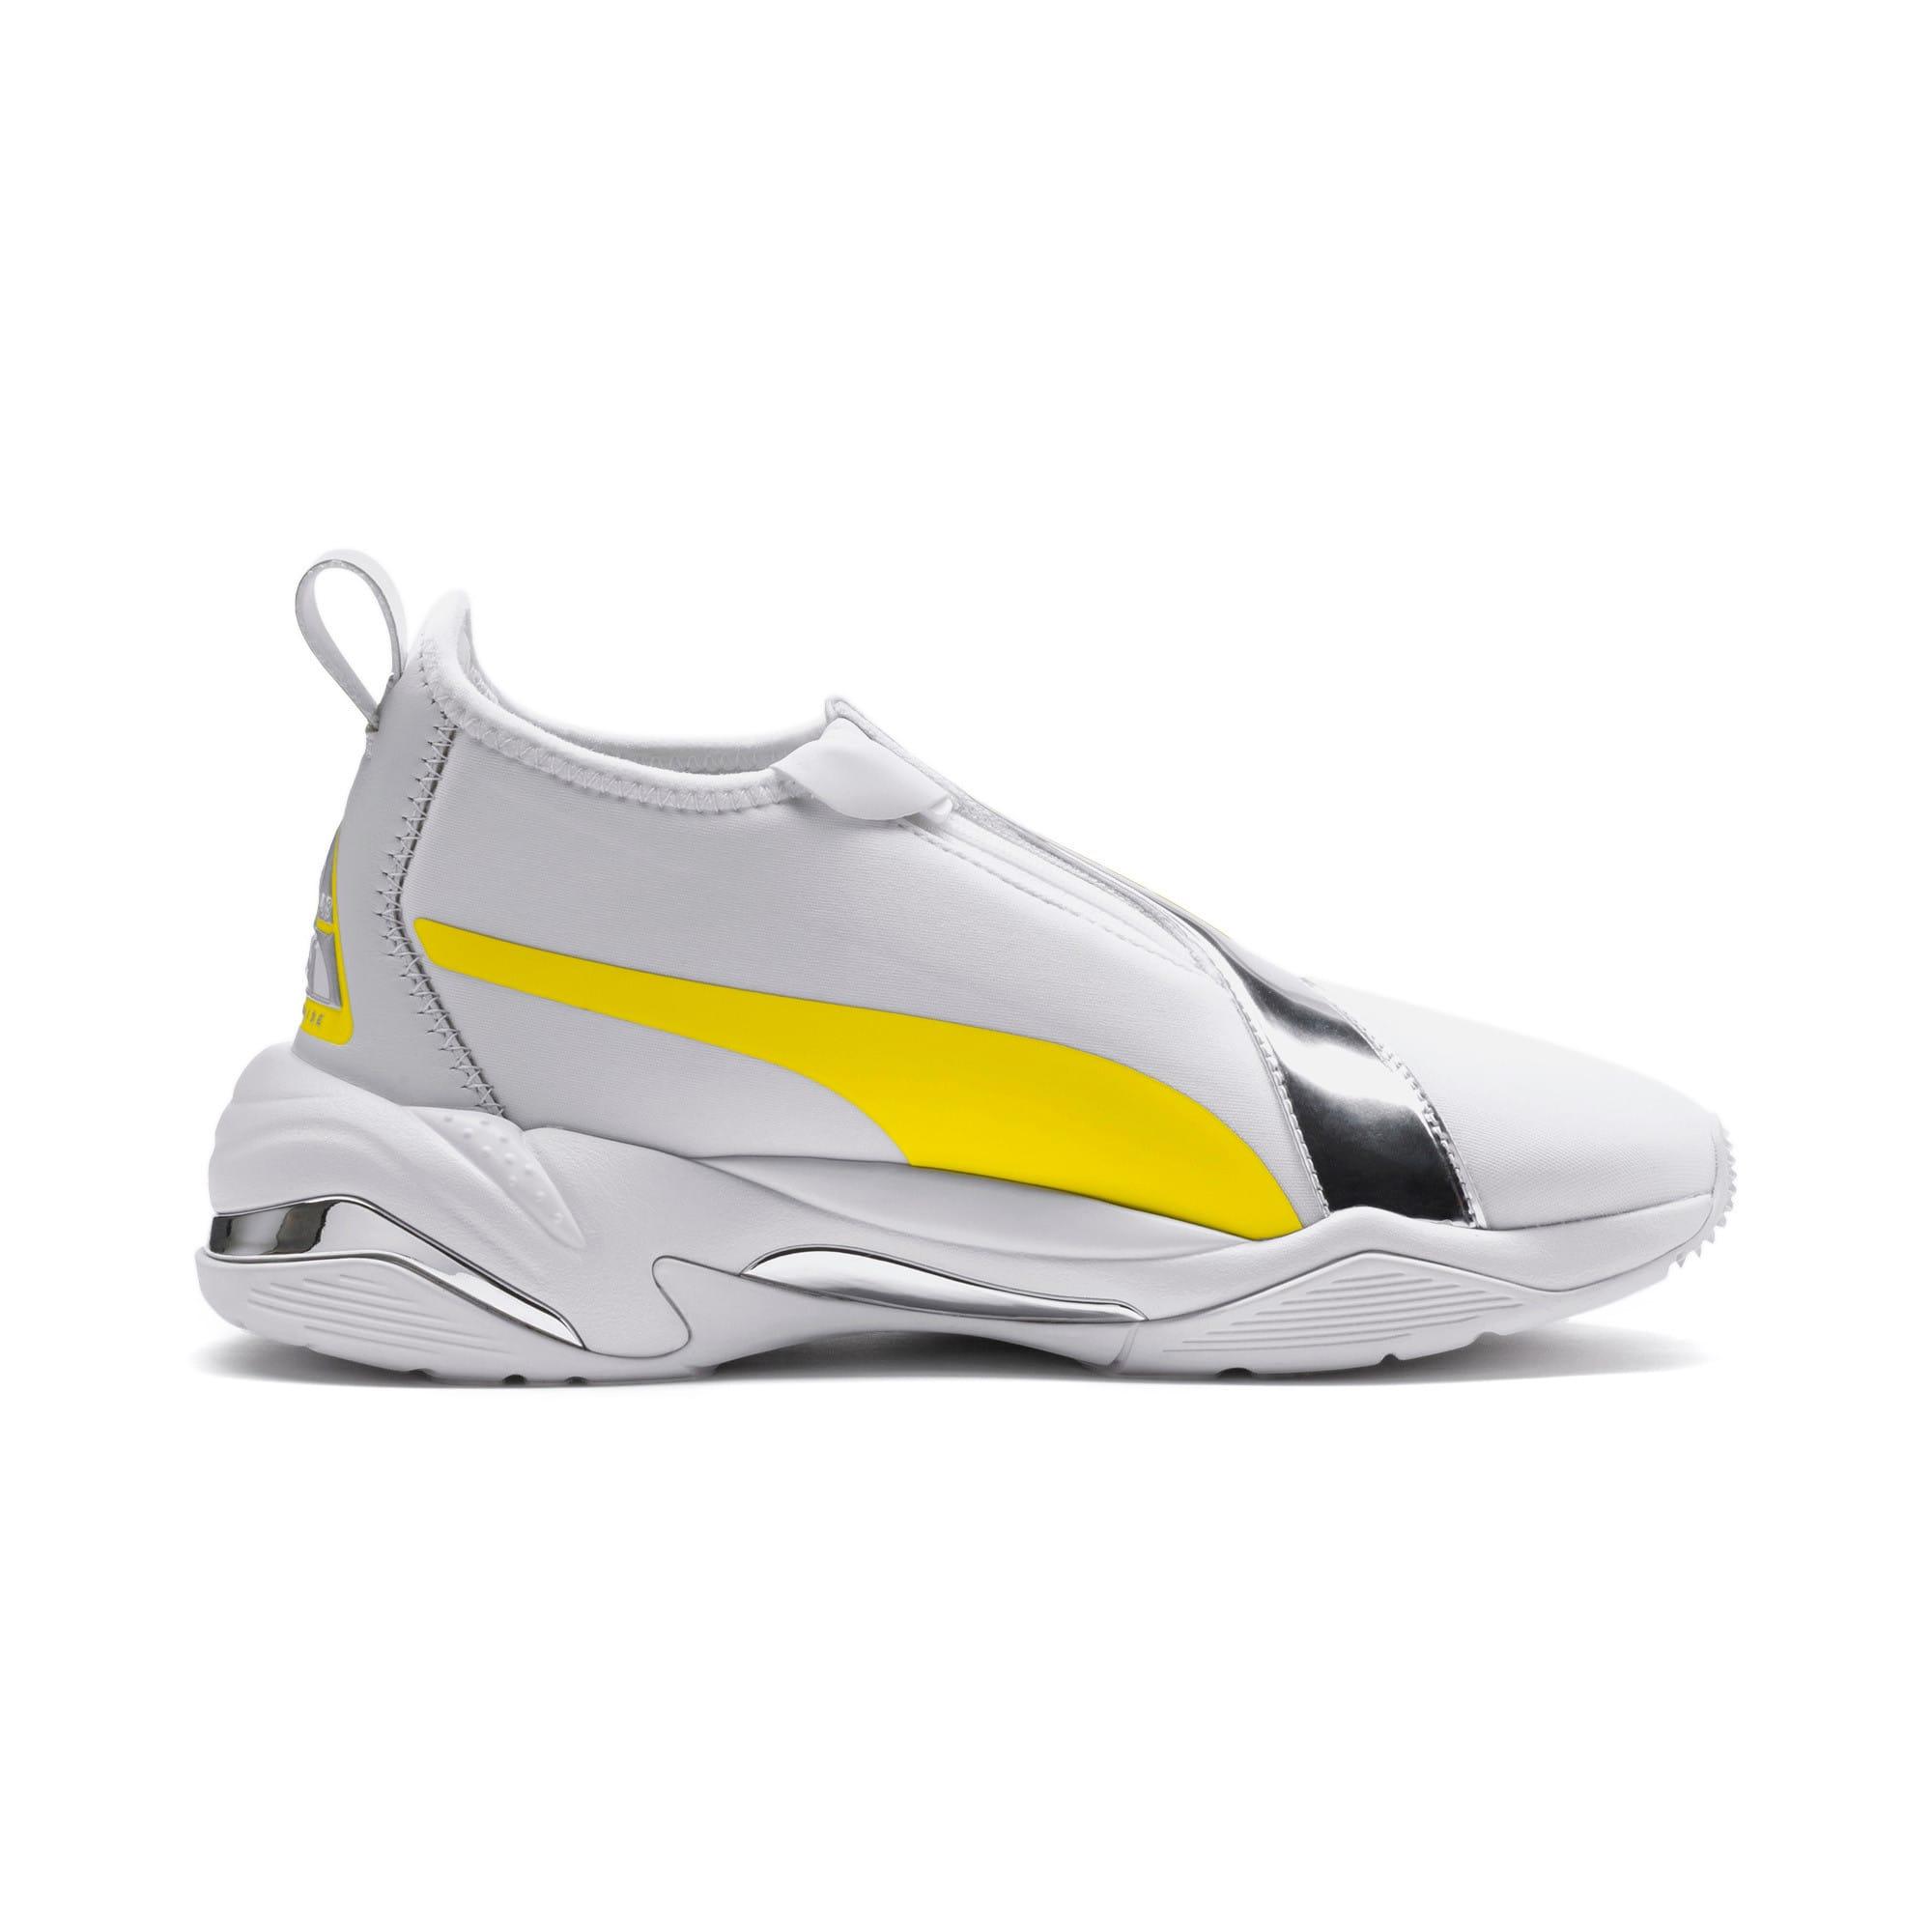 Miniatura 6 de Zapatos deportivos para mujer Thunder TrailblazerMetallic, Puma White-Blazing Yellow, mediano